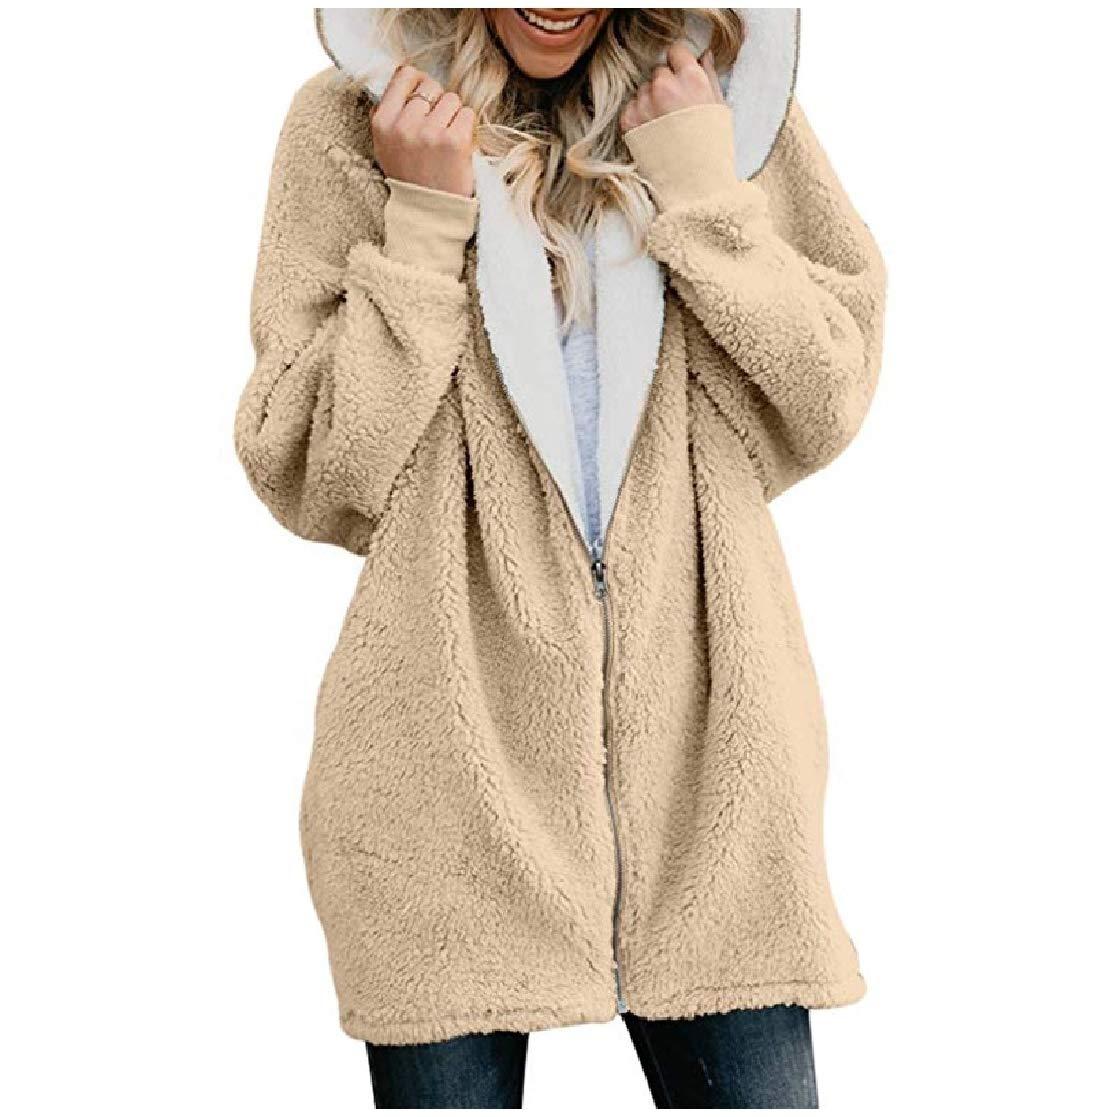 YUNY Women Mid-Long Warm Zip Up Hoode Velvet Relaxed Outwear Jacket Apricot XL